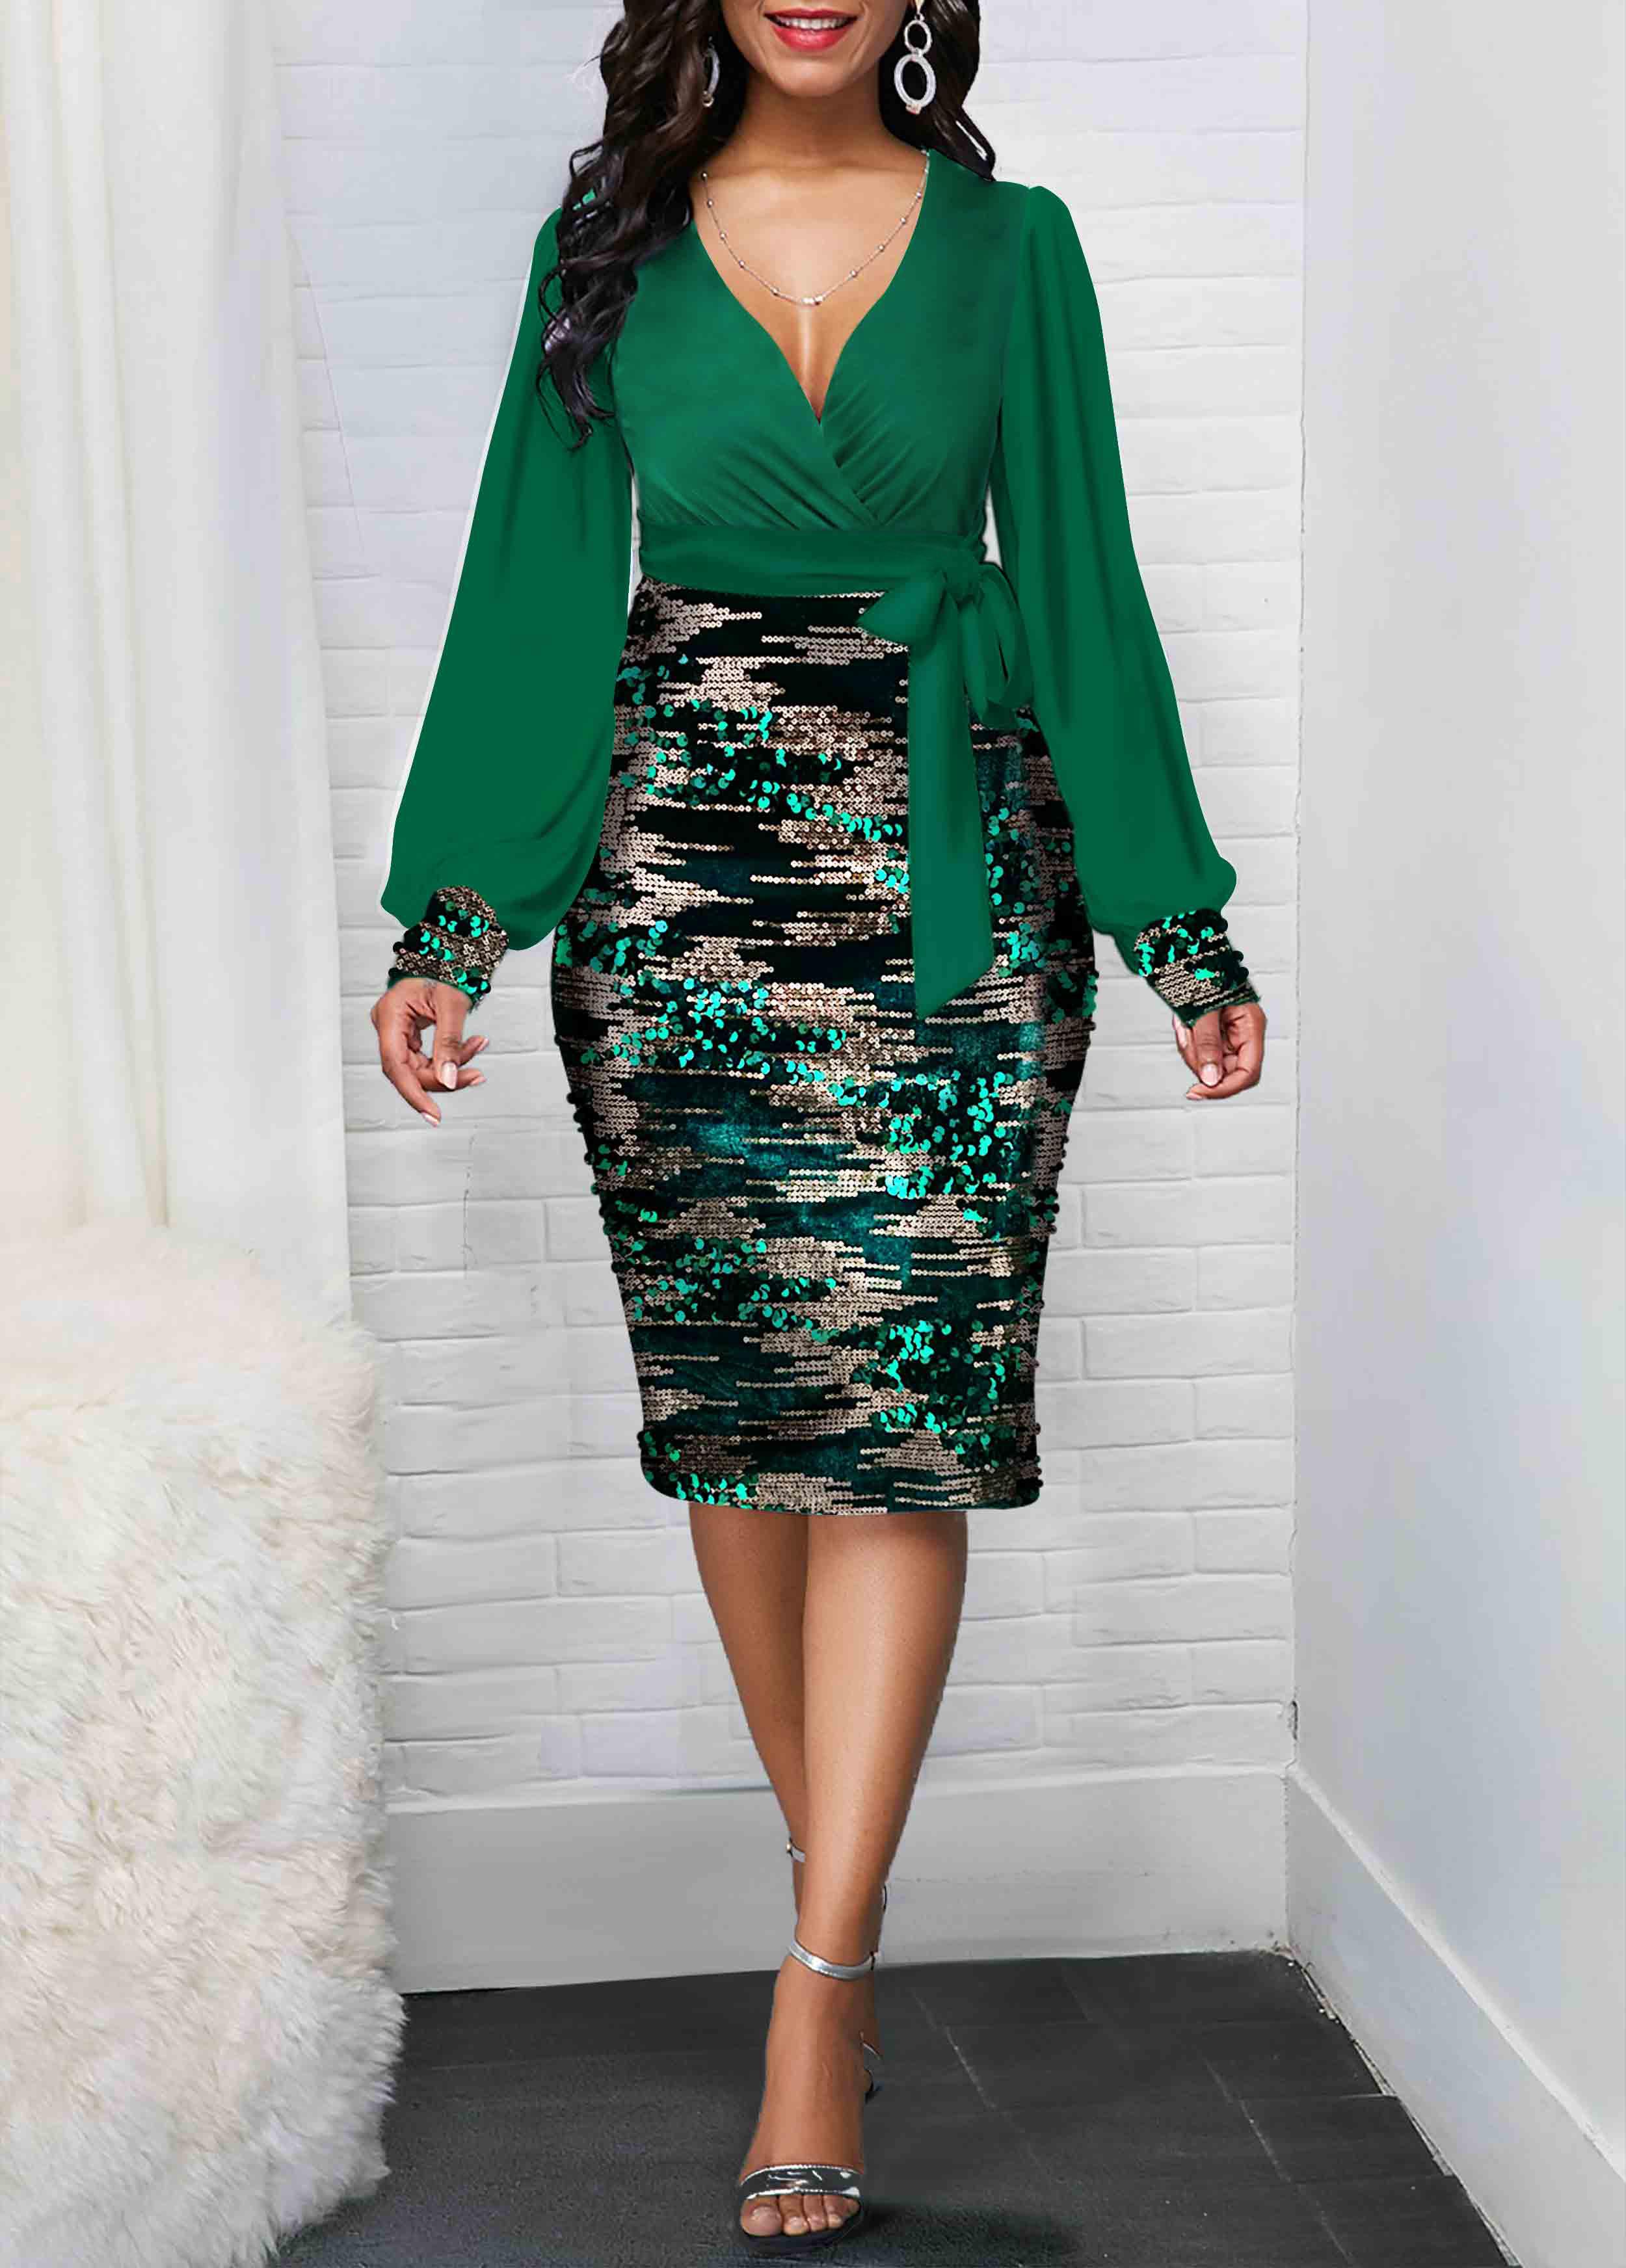 Sequin Detail Tie Side Plunging Neck Dress